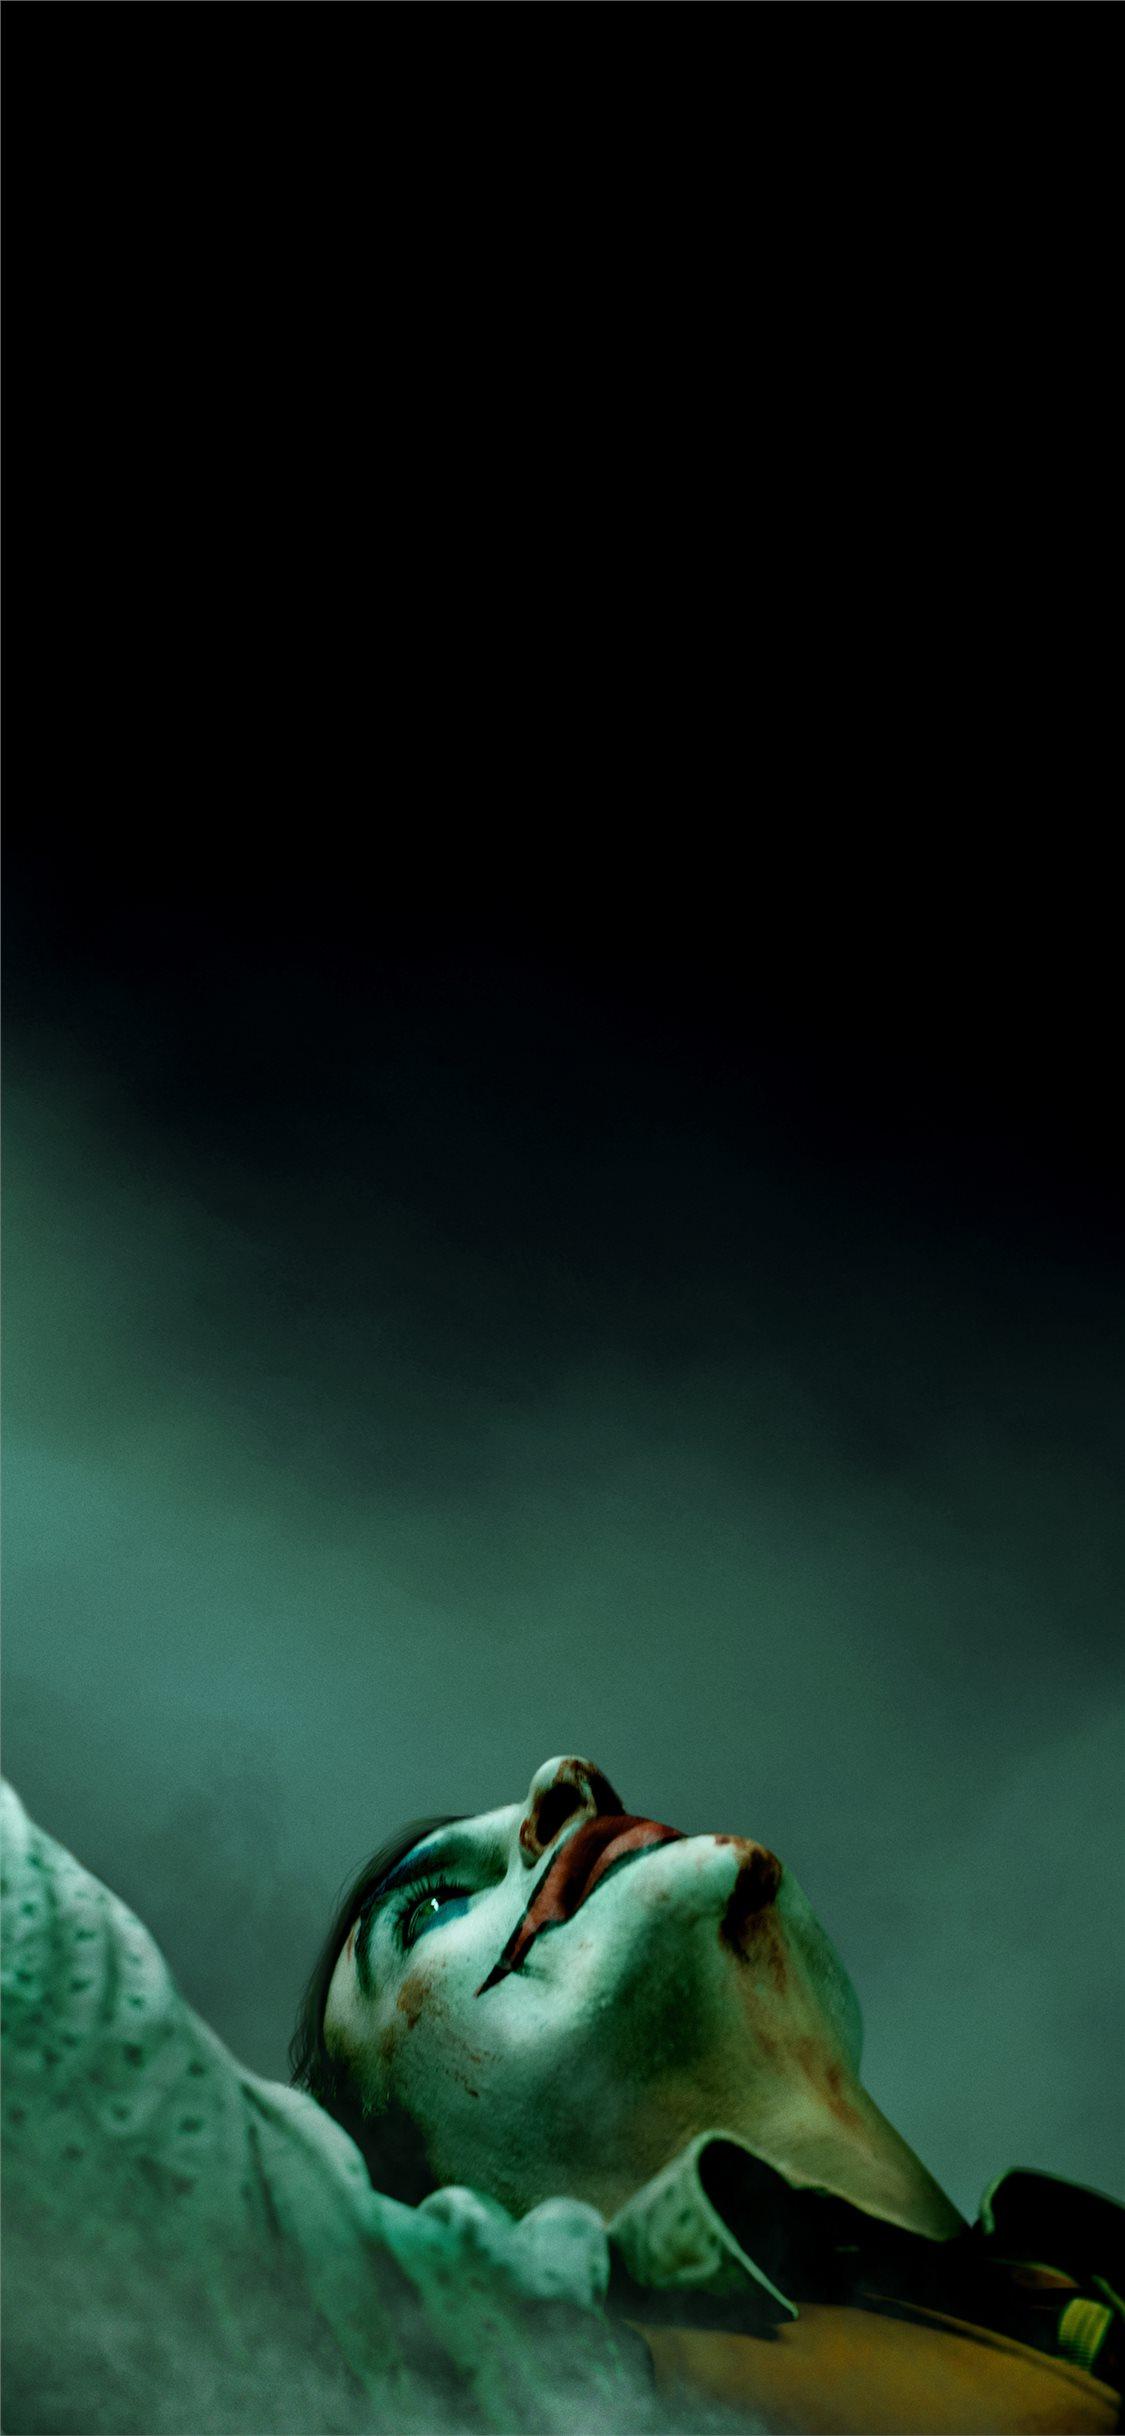 Best movies iPhone X Wallpapers HD - iLikeWallpaper